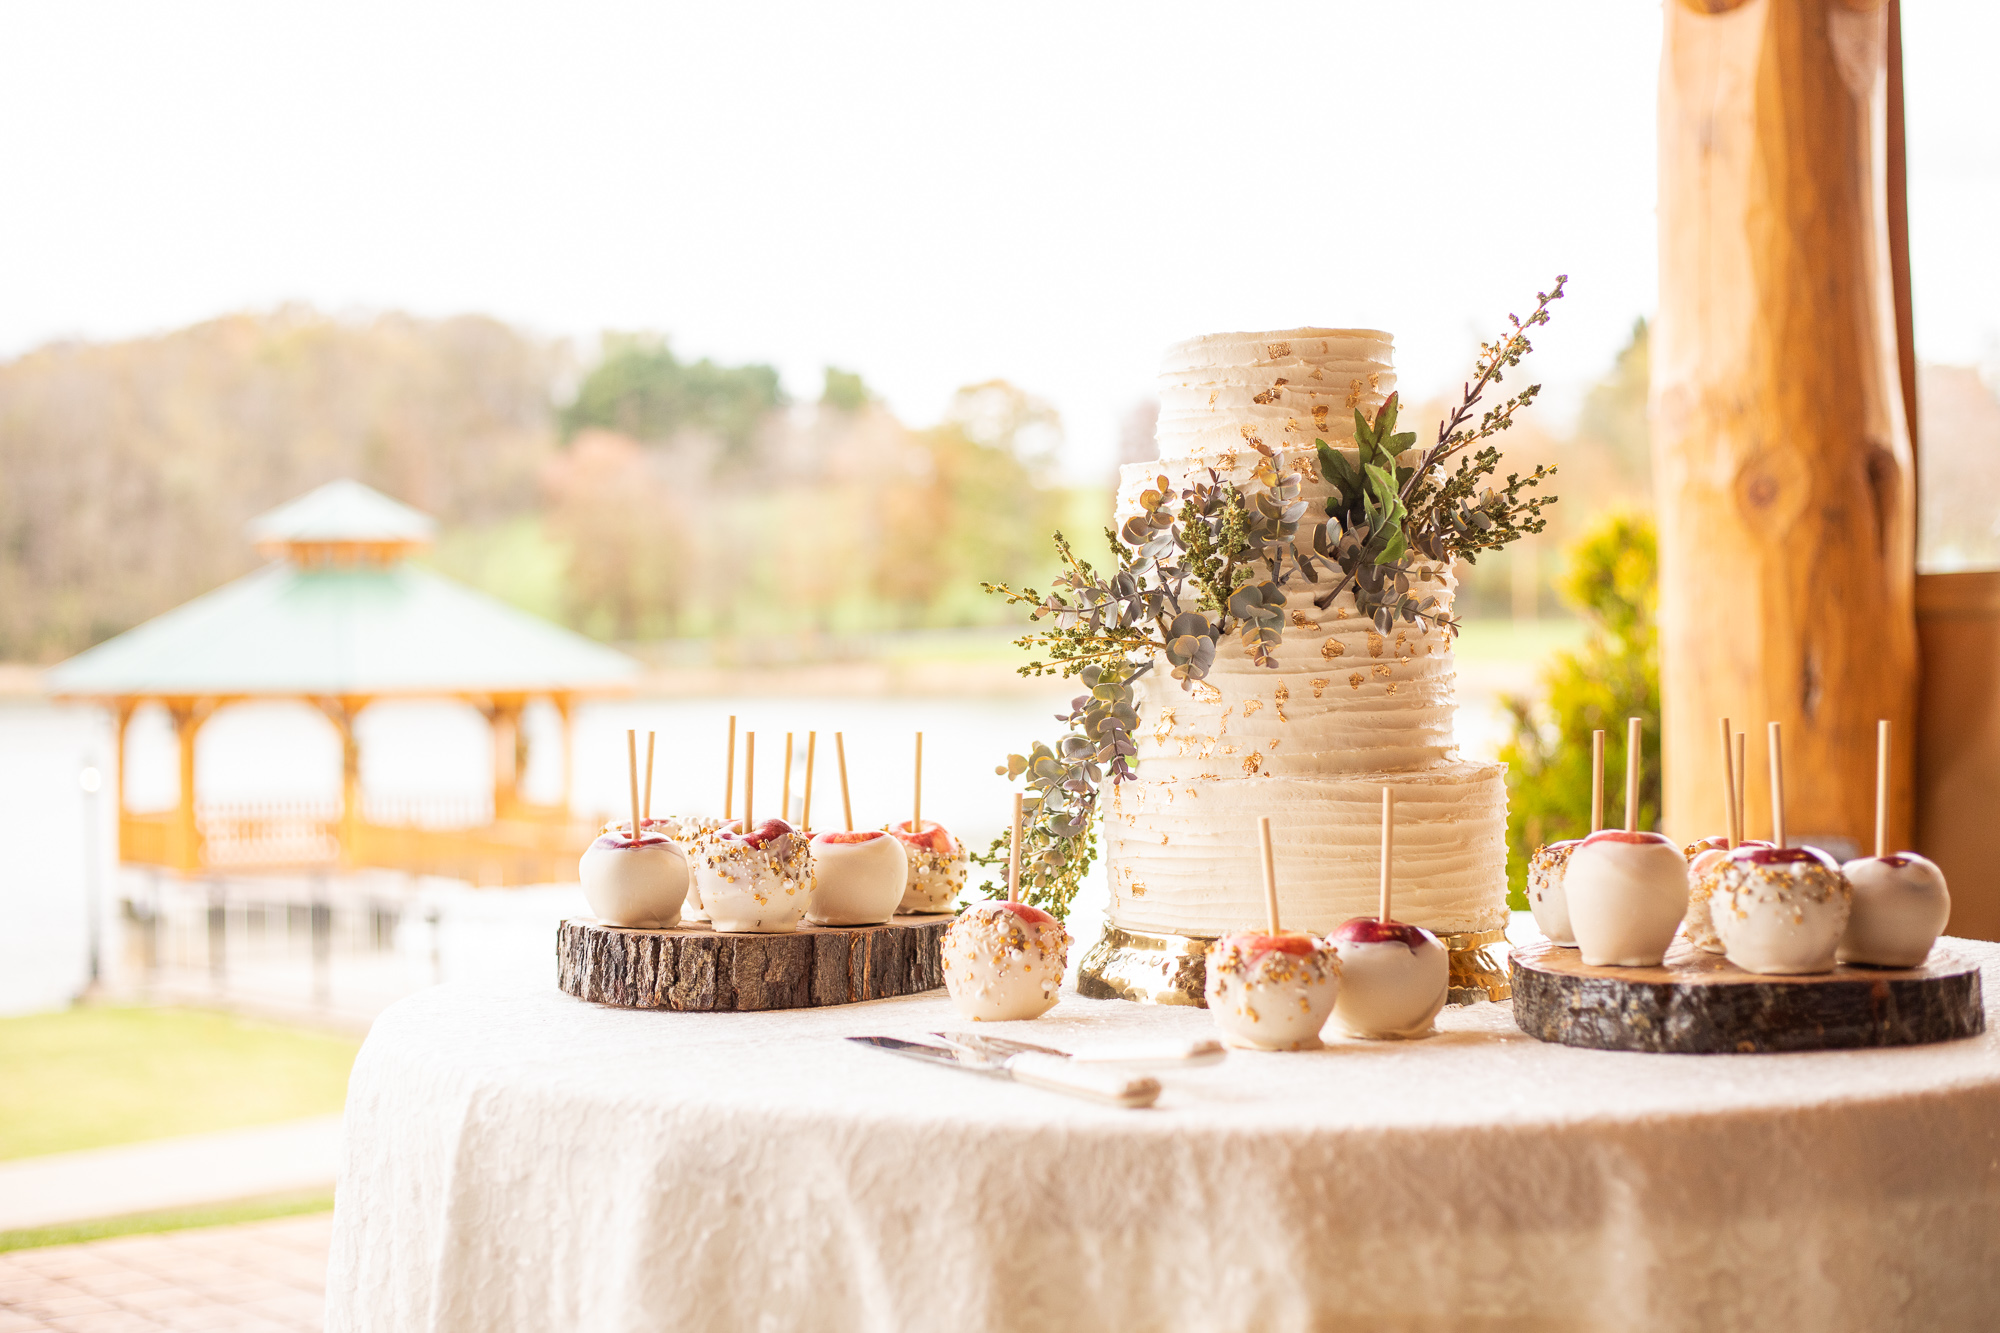 Nizhoni Bakery wedding cake and candied apples at autumn wedding styled shoot.